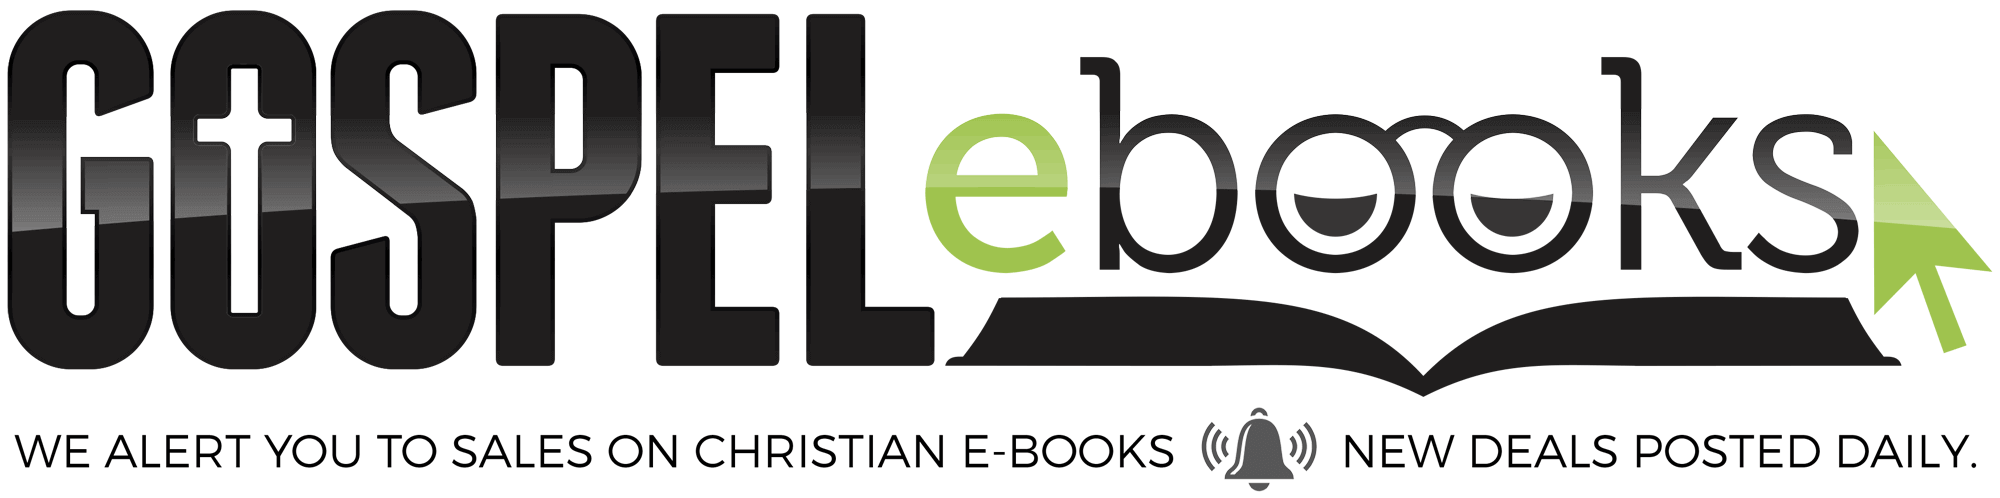 Gospel ebooks free discount christian e books logo logo logo fandeluxe Epub